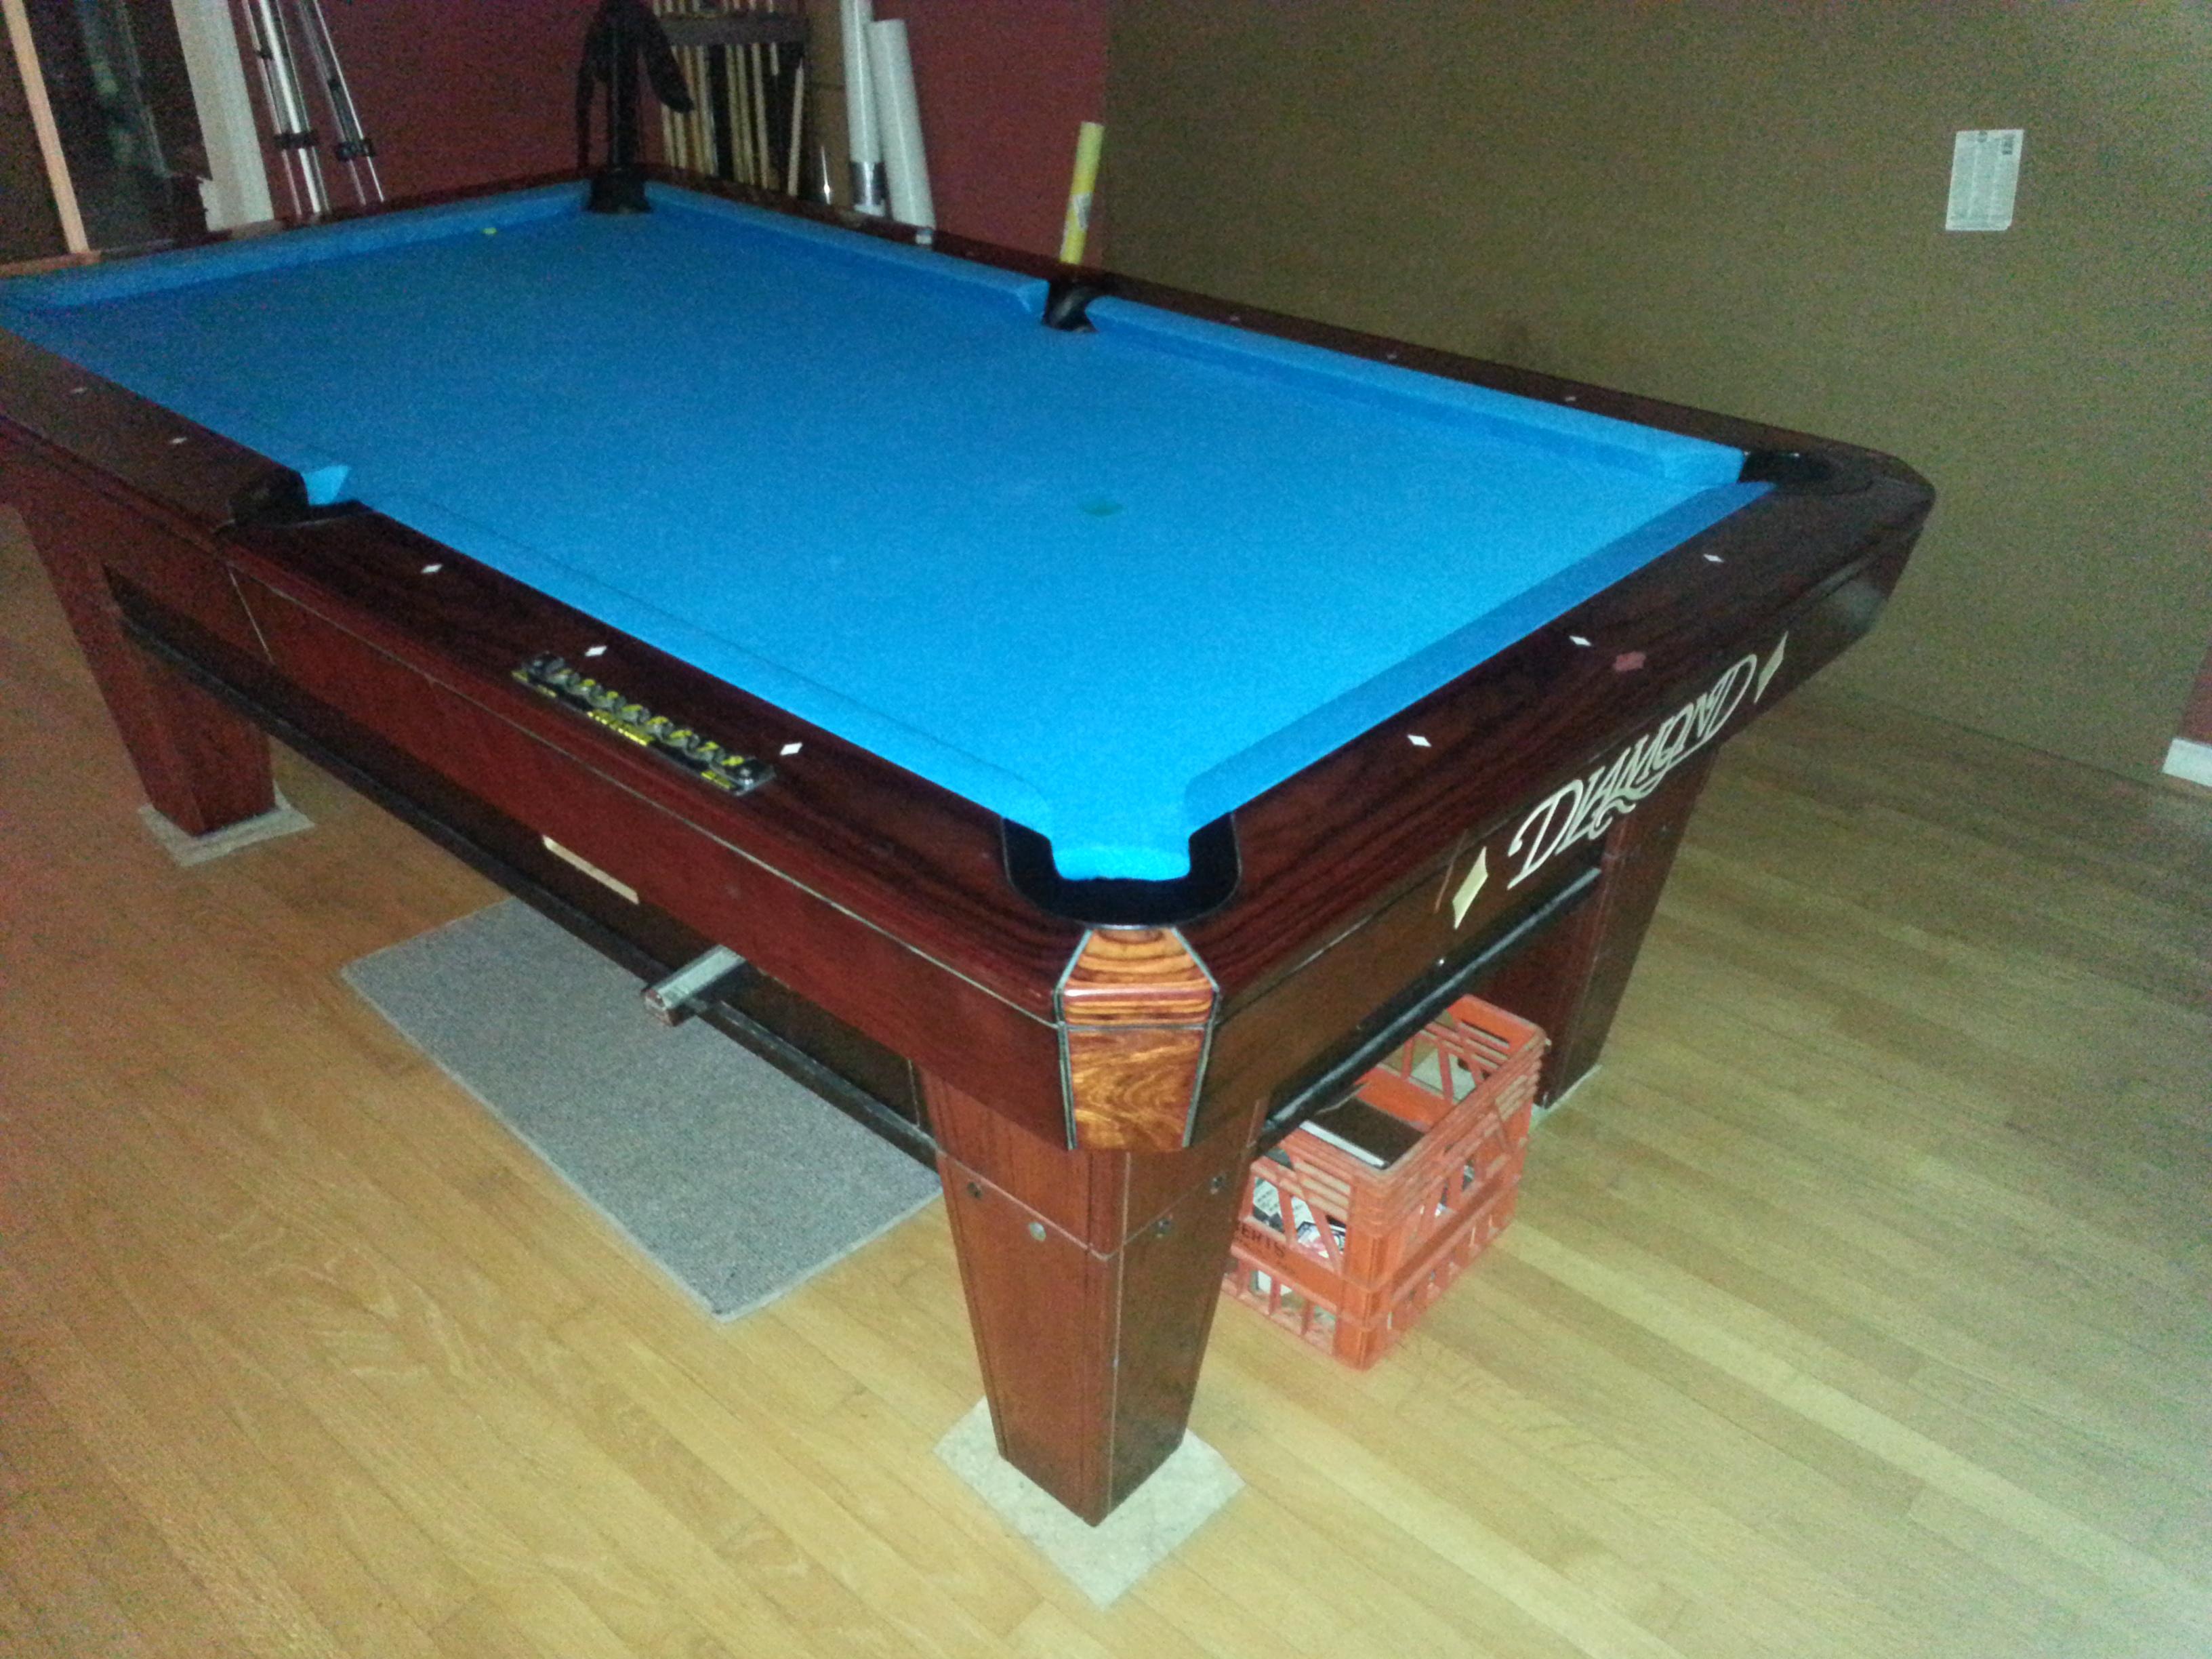 Diamond Smart Table For Sale Dallas TX - Diamond smart table for sale